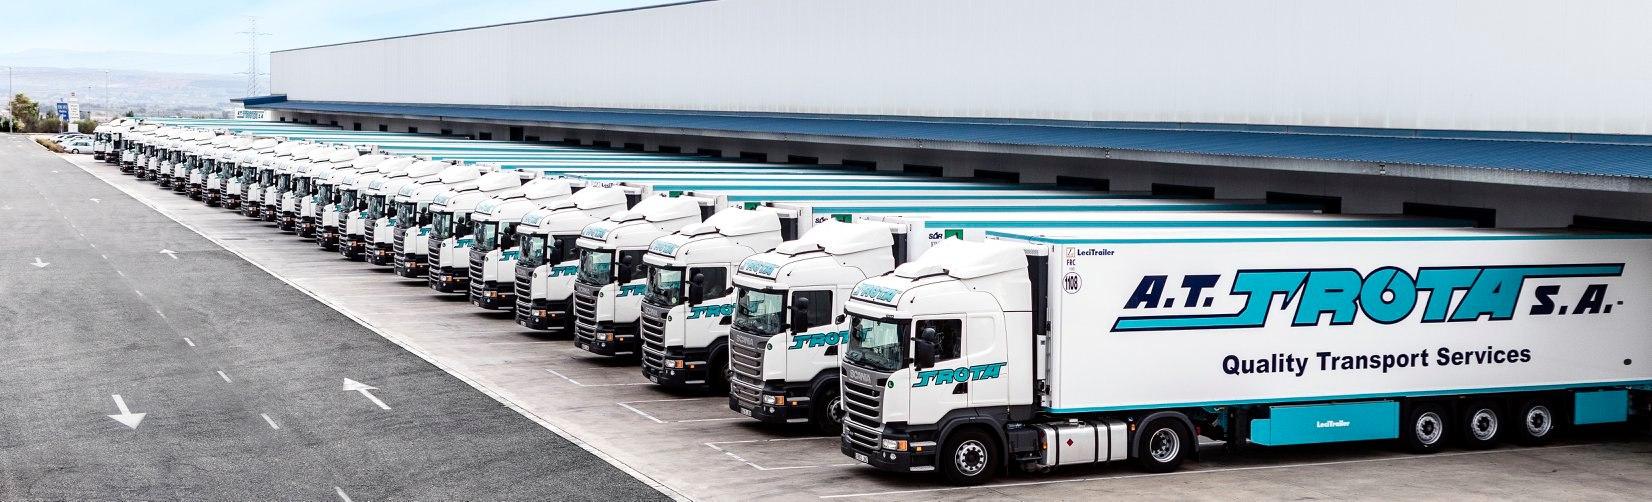 Scania-2-2-2020-